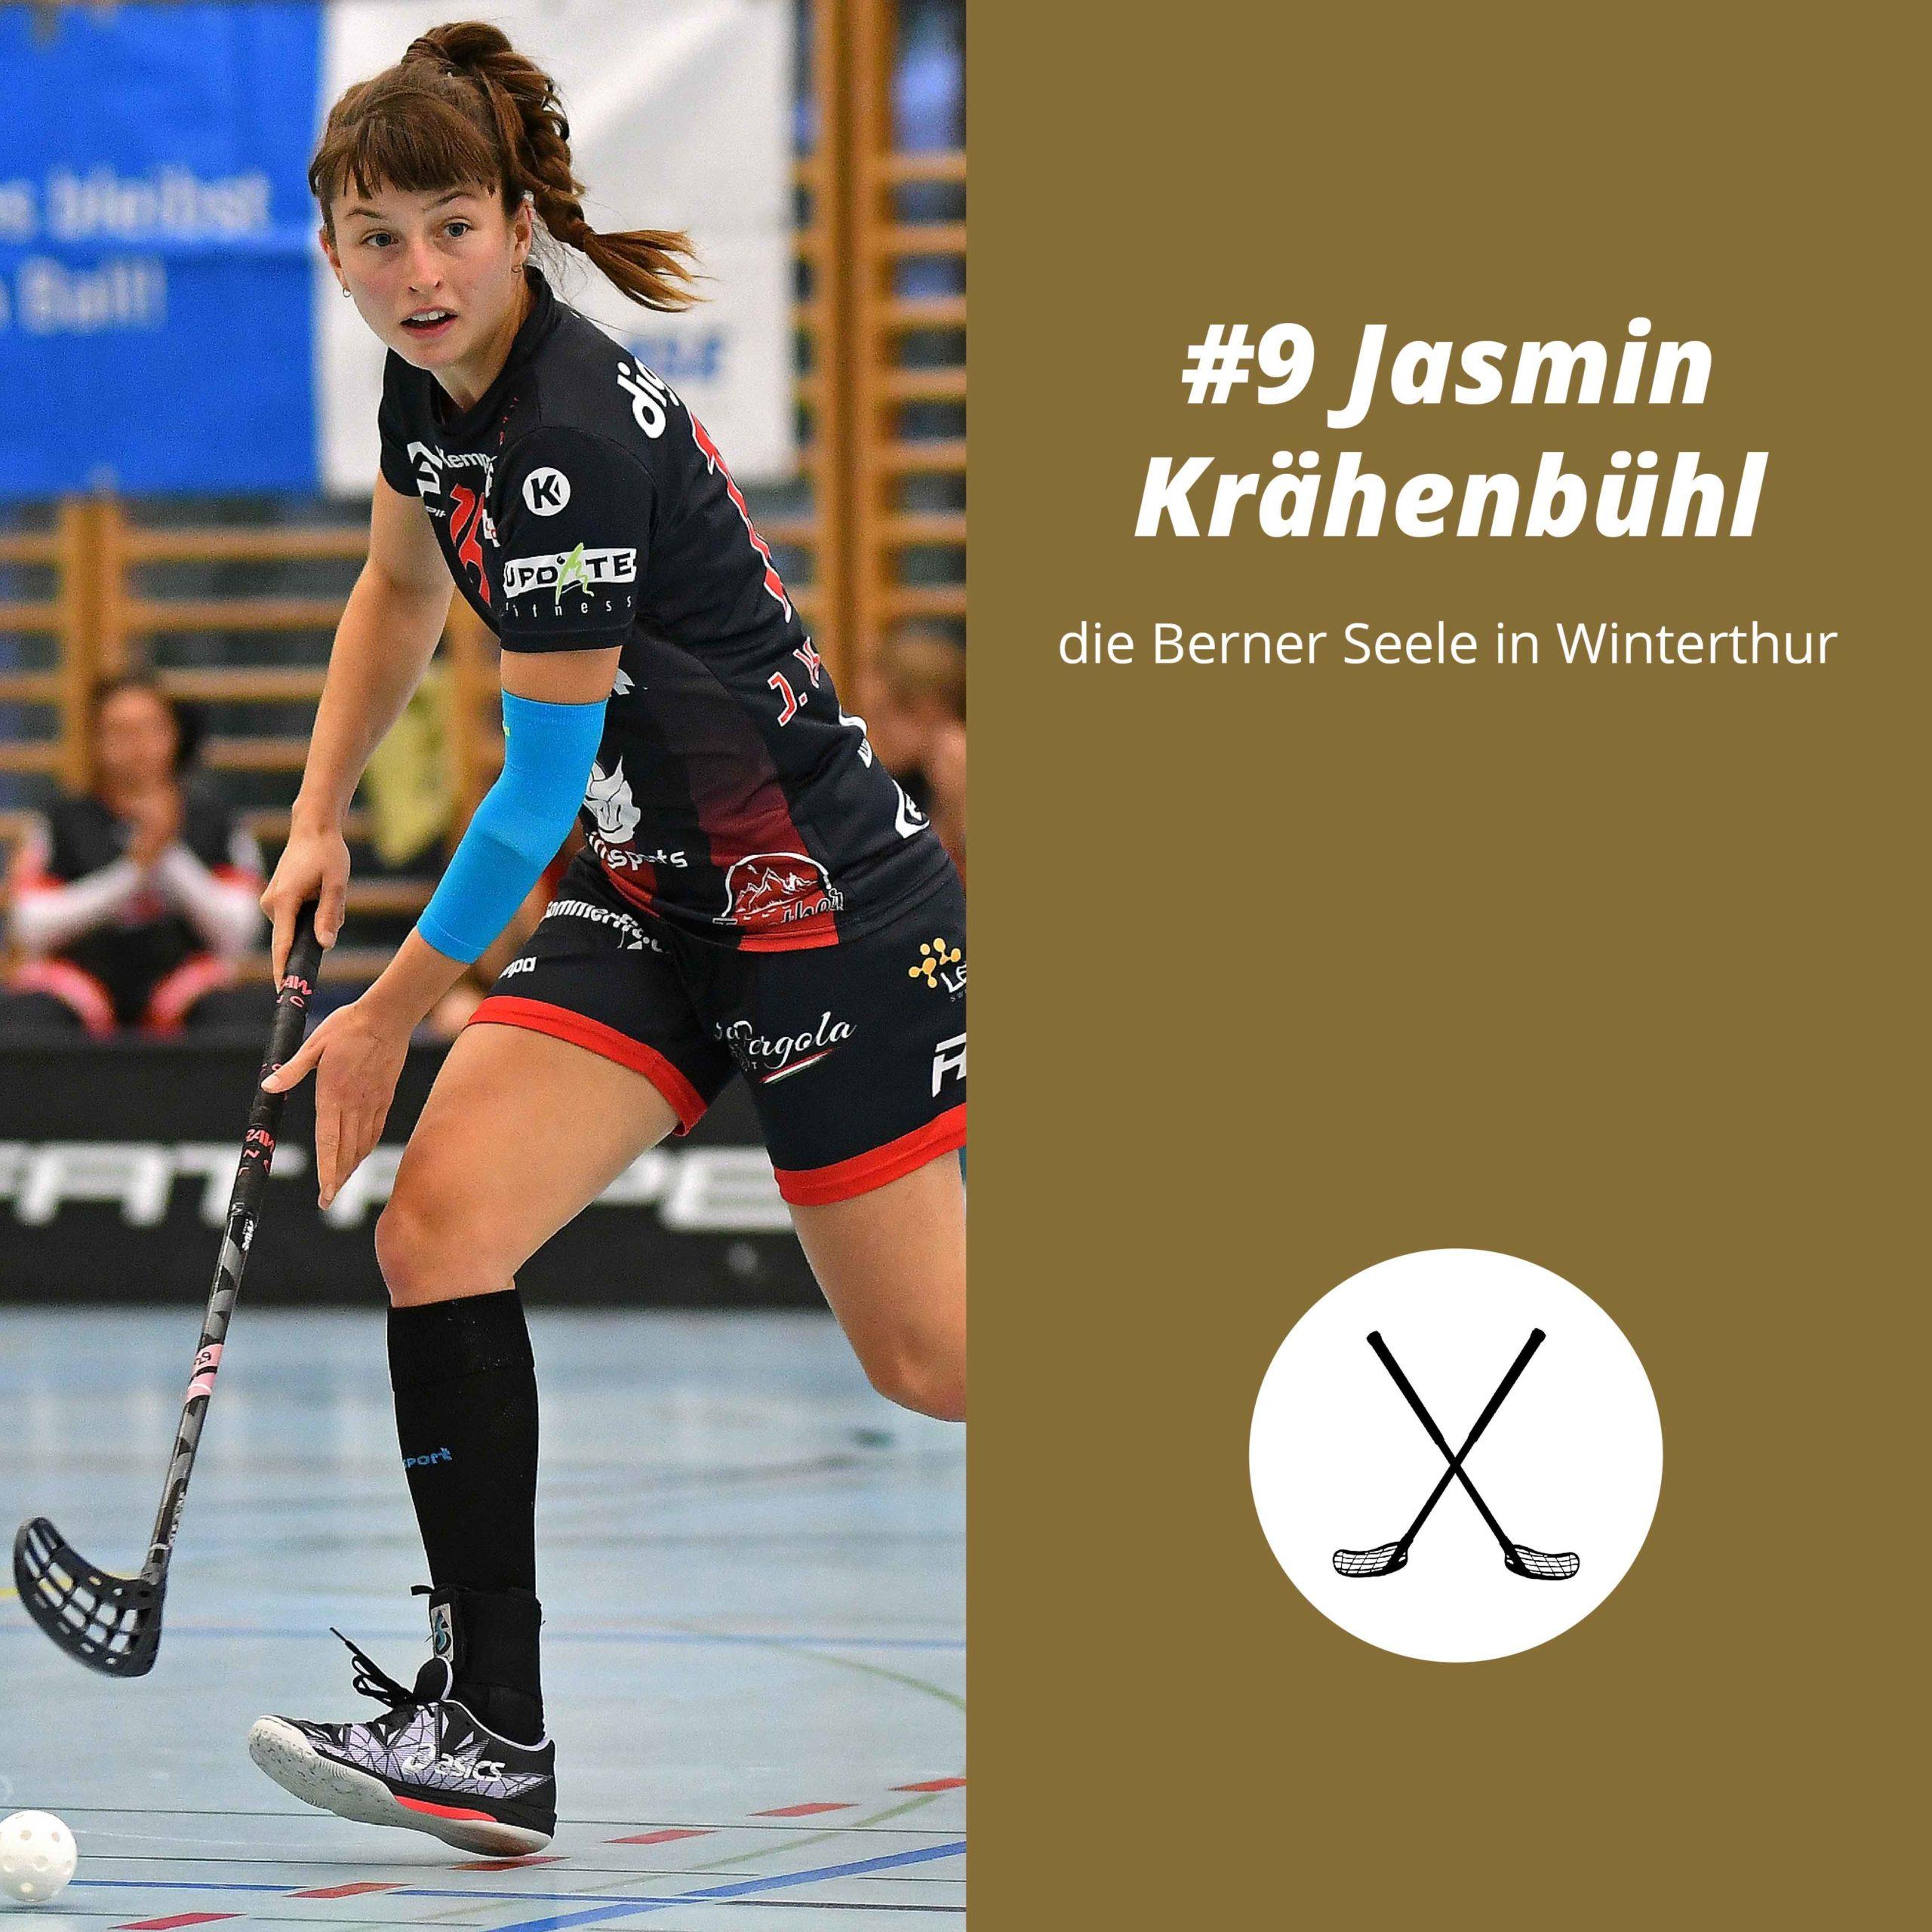 #9 Jasmin Krähenbühl, die Berner Seele in Winterthur